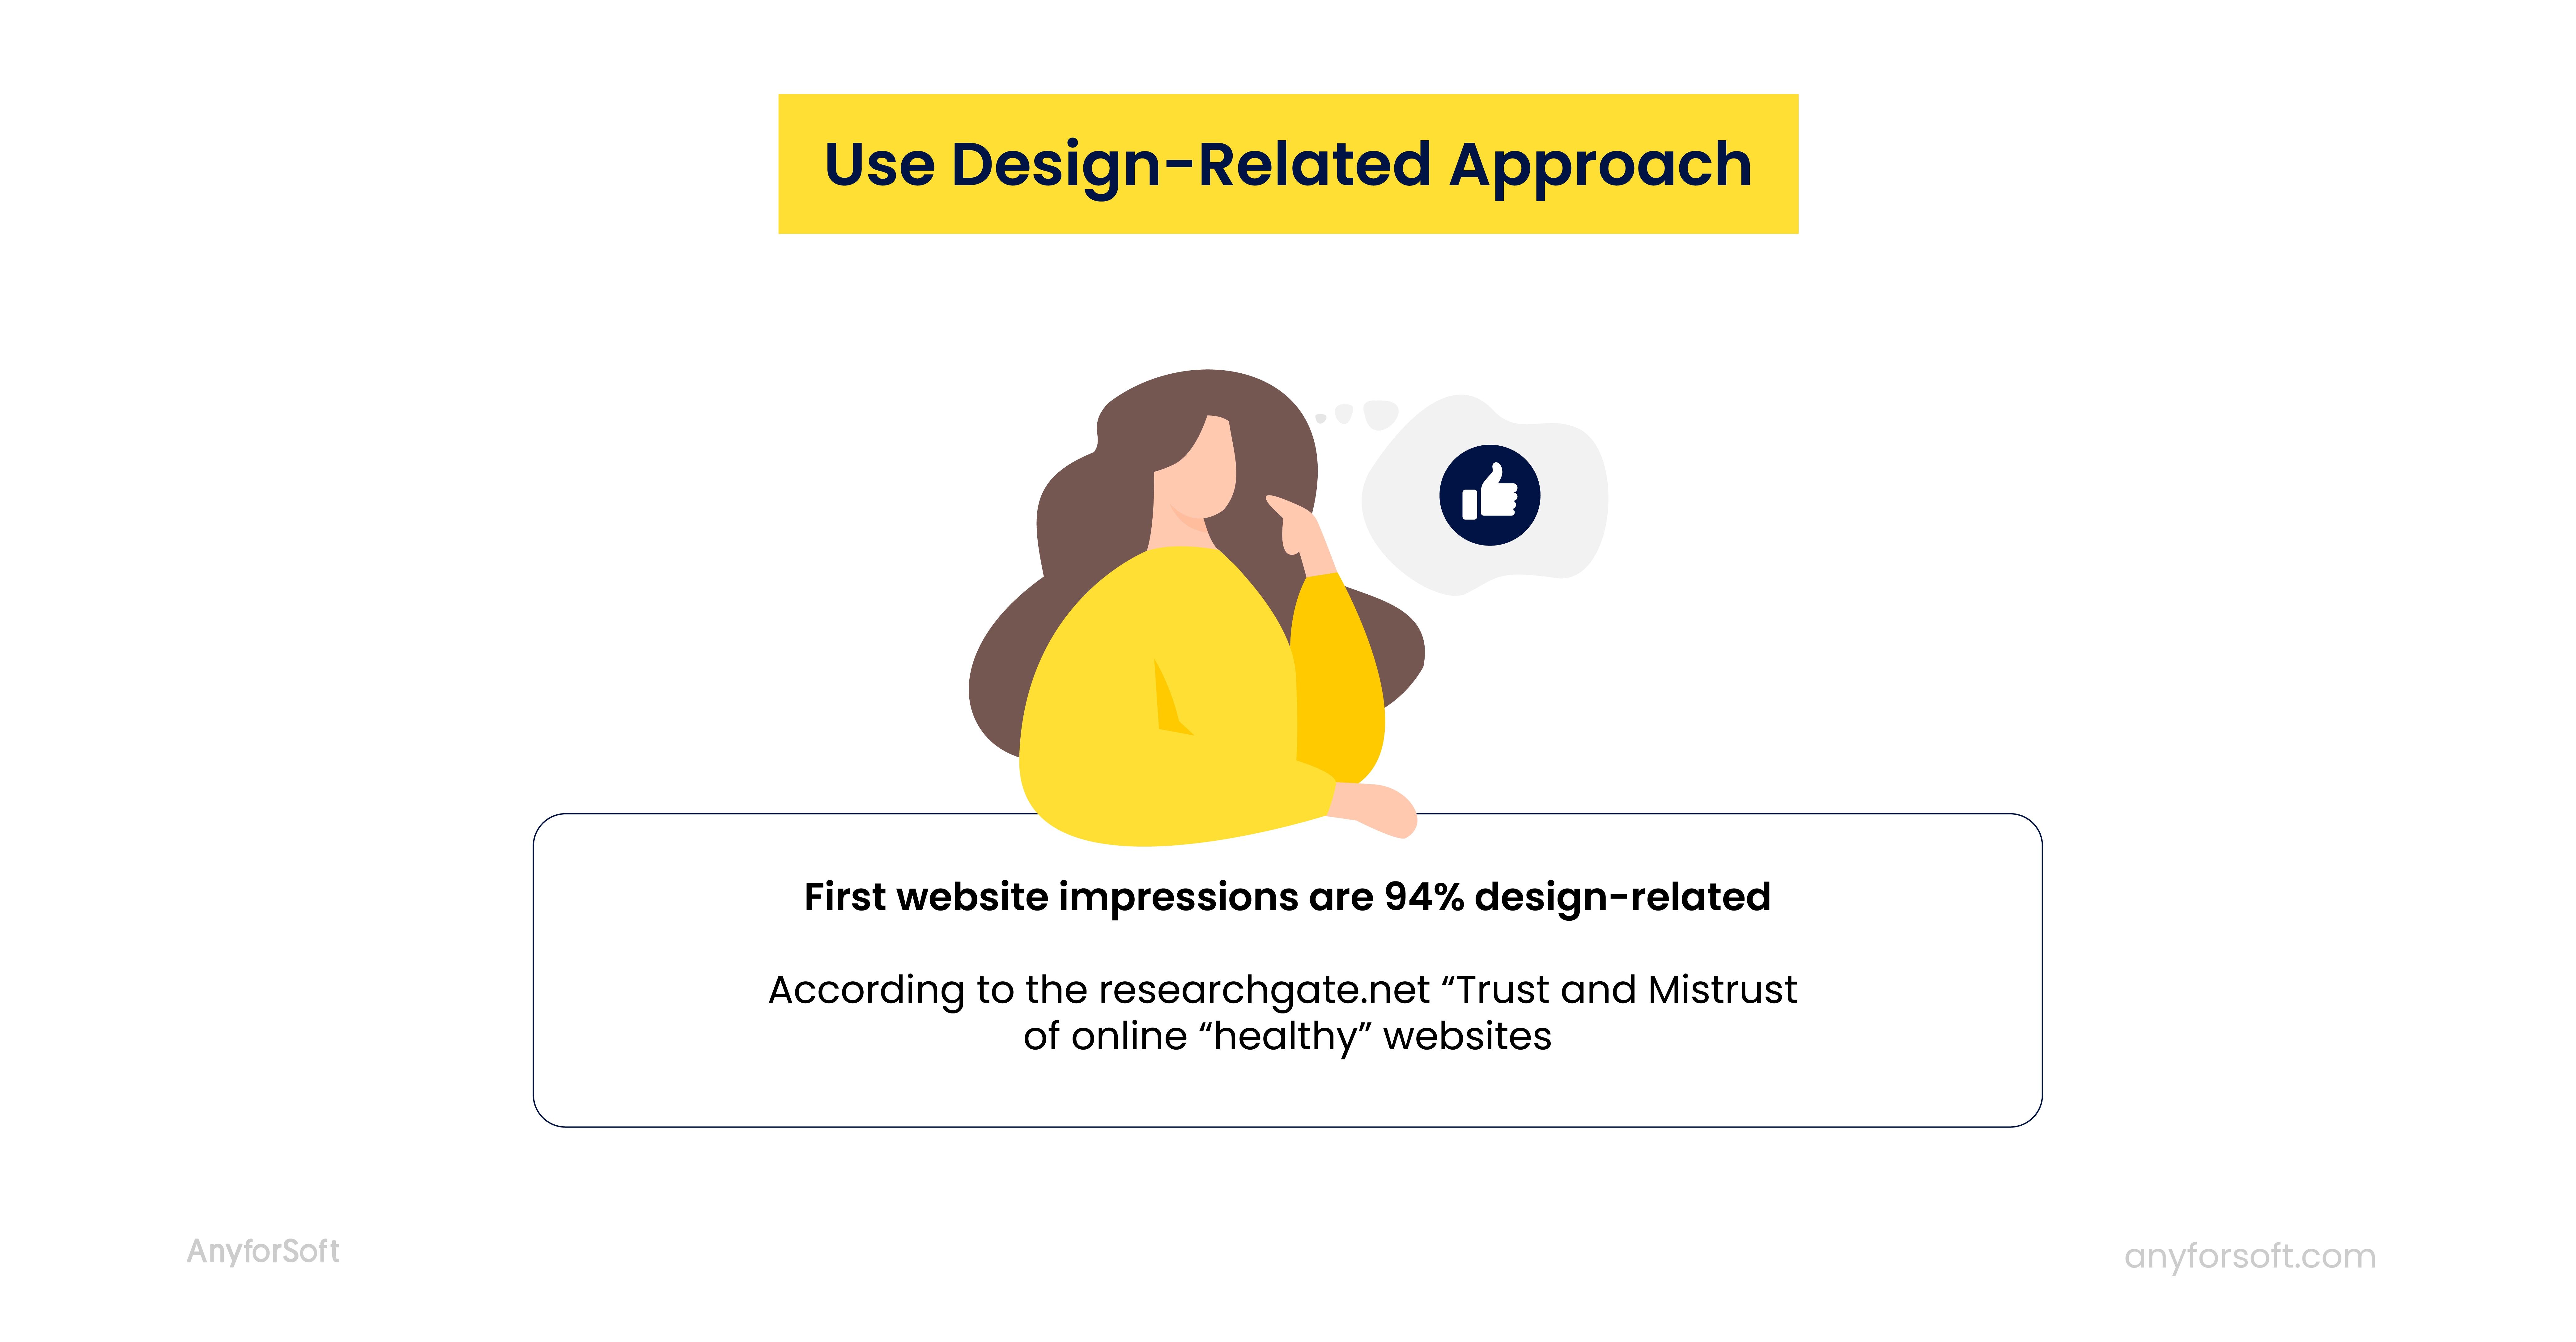 Design-related aprroach